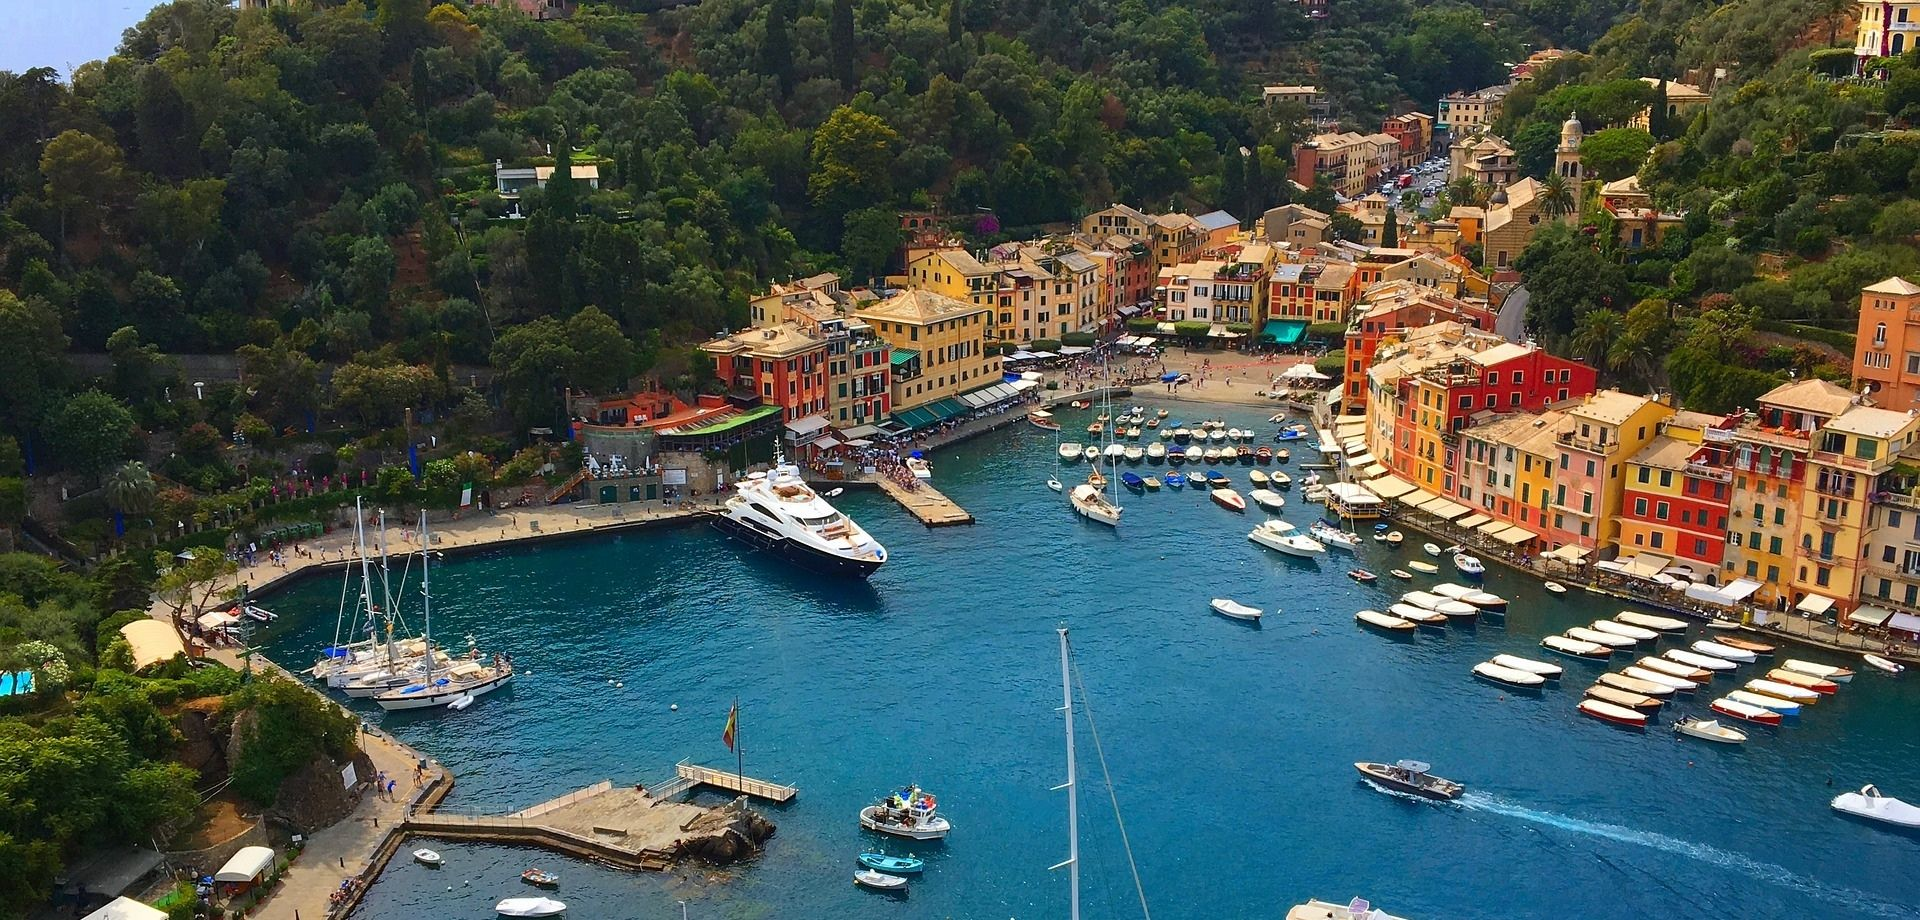 Tour on the Ligurian Coast